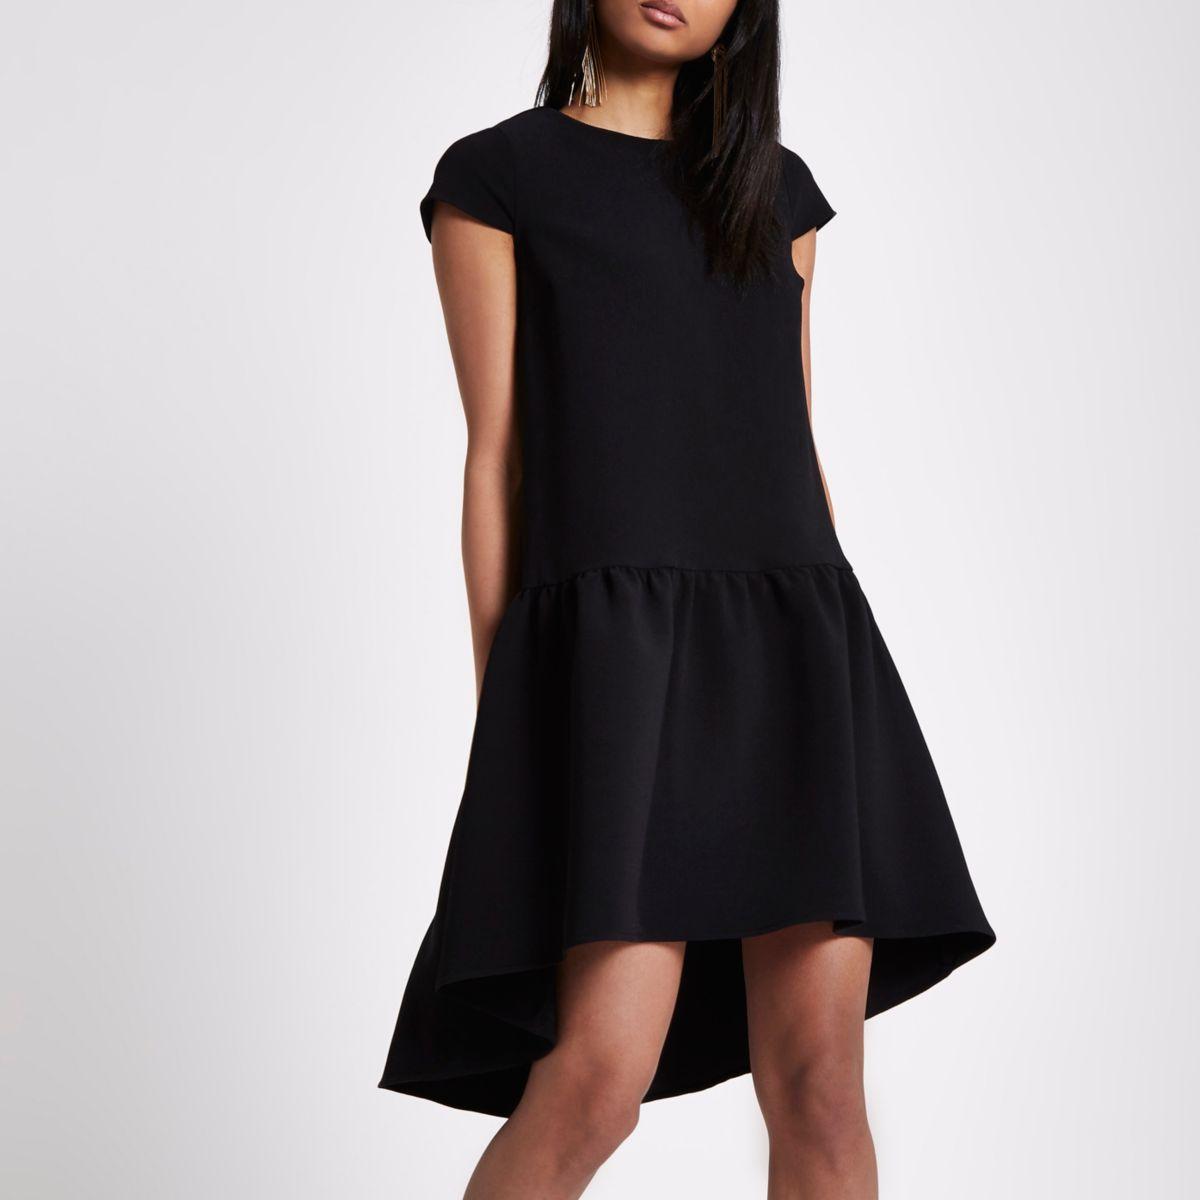 Black dropped waist cap sleeve swing dress